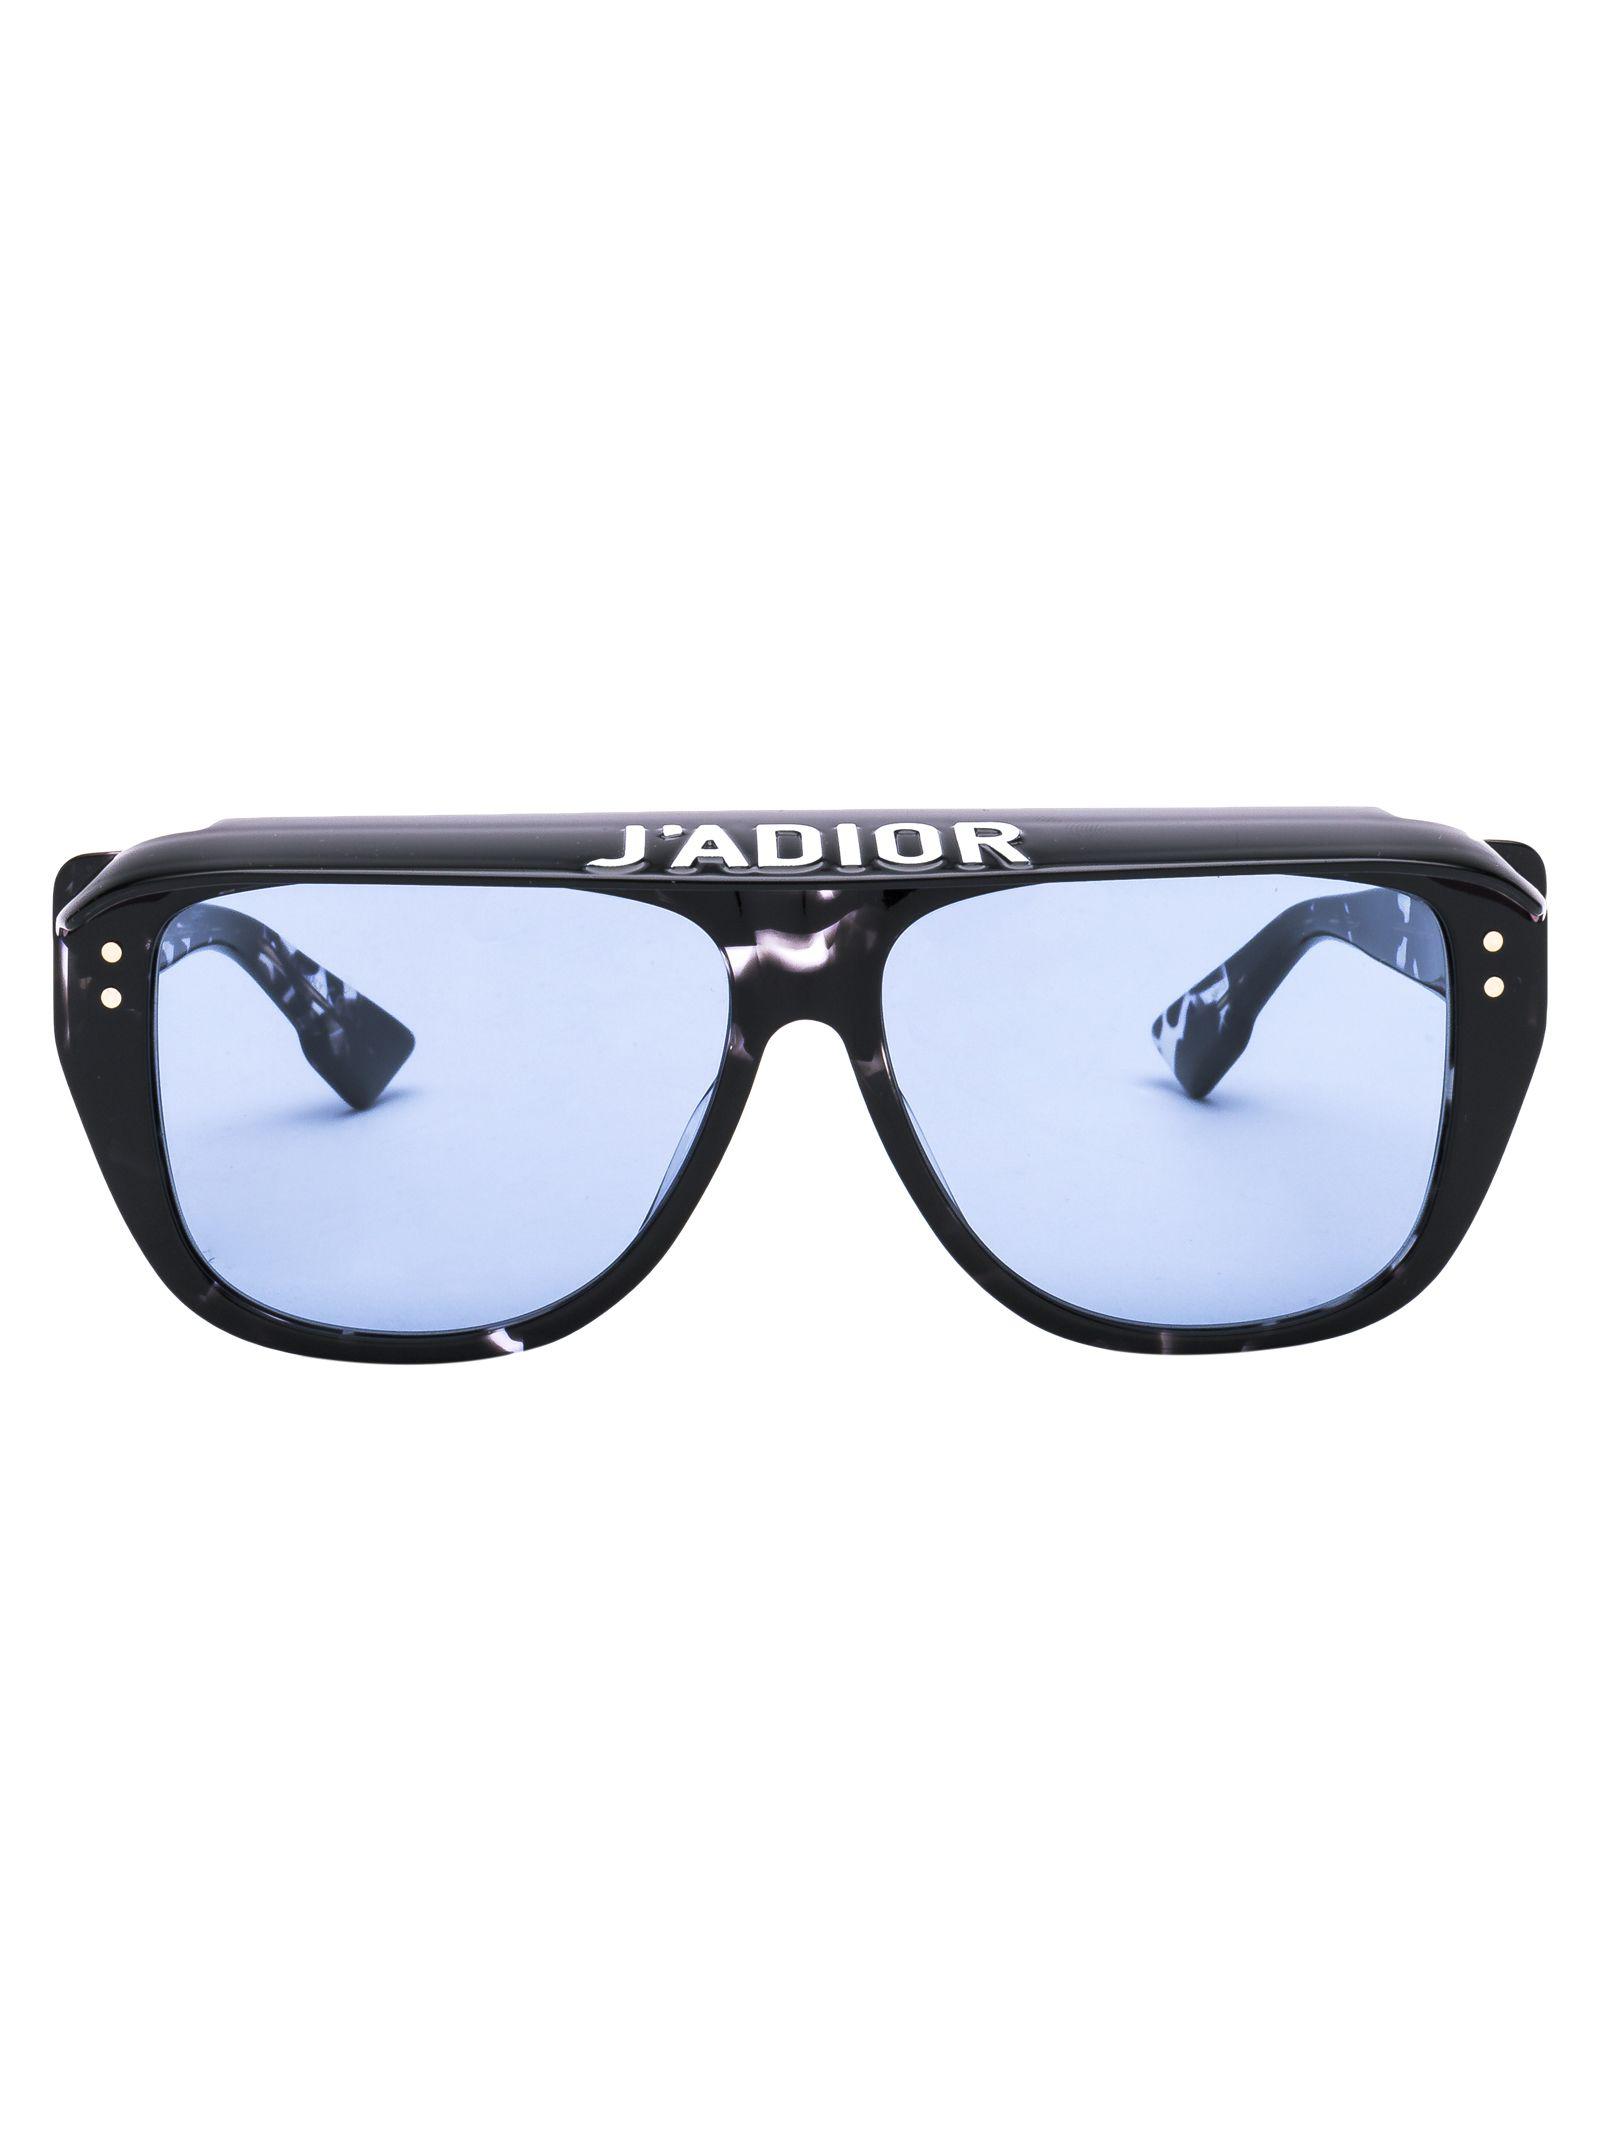 3c1b68fde244 Dior Club 2 Sunglasses In 9Wzku